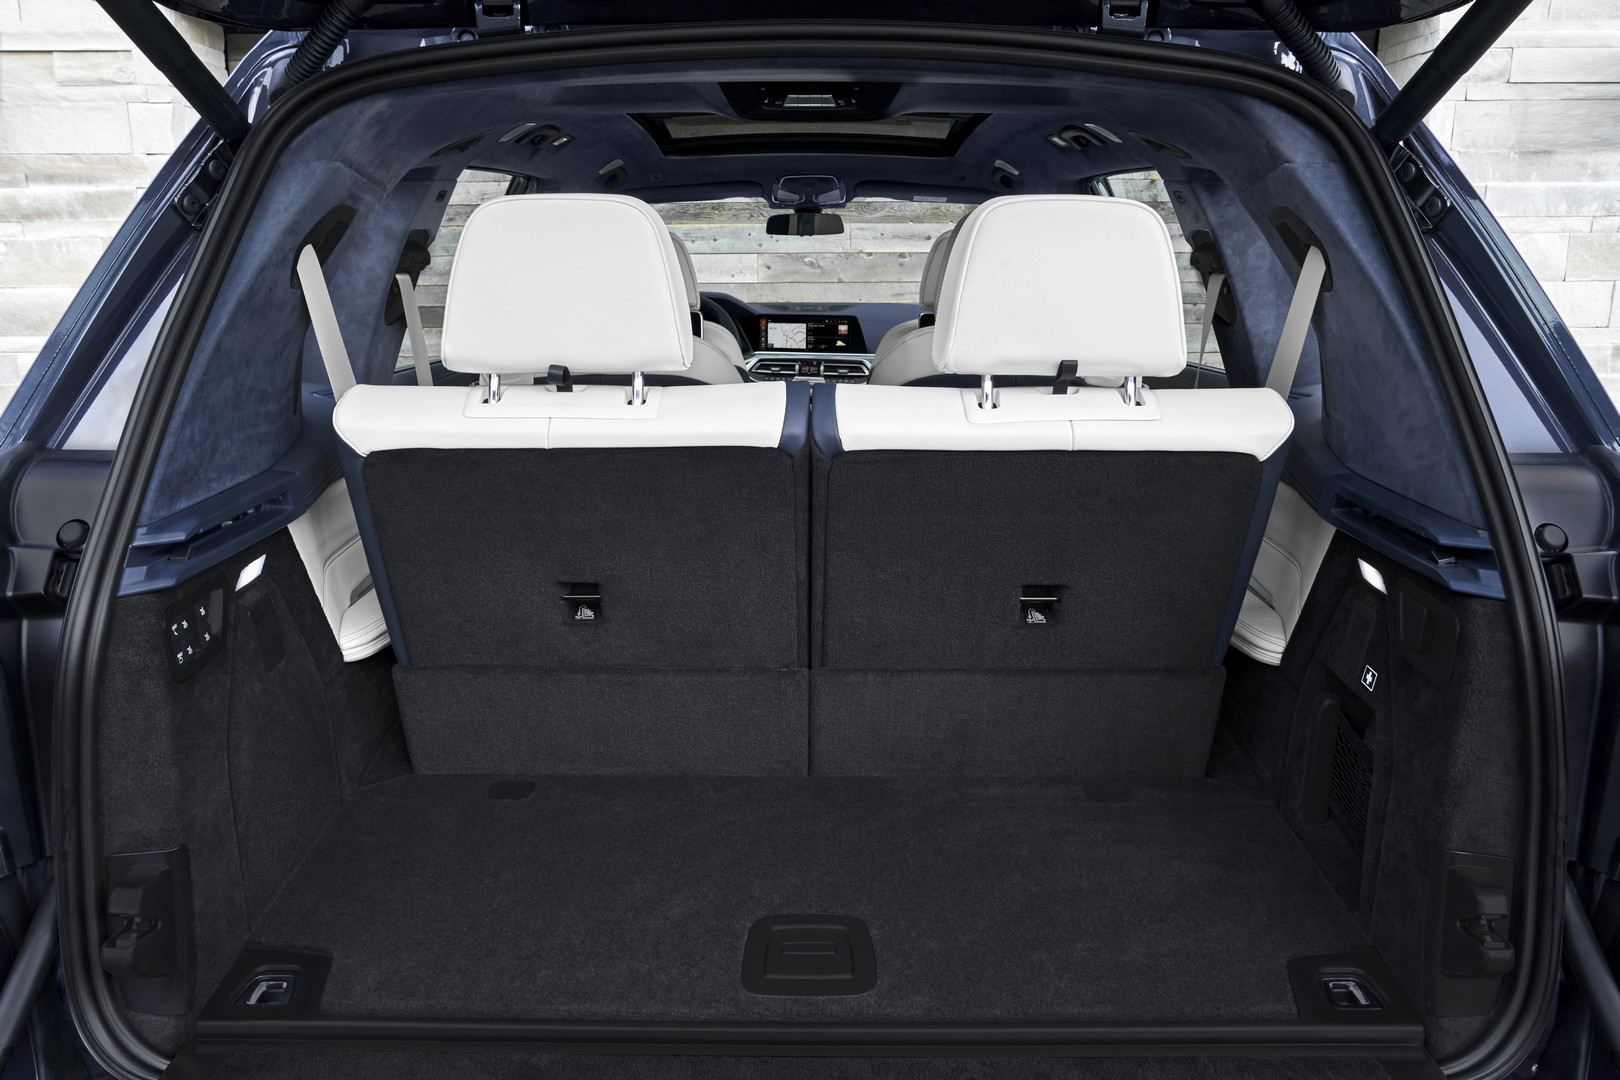 2019 BMW X7 Trunk Space